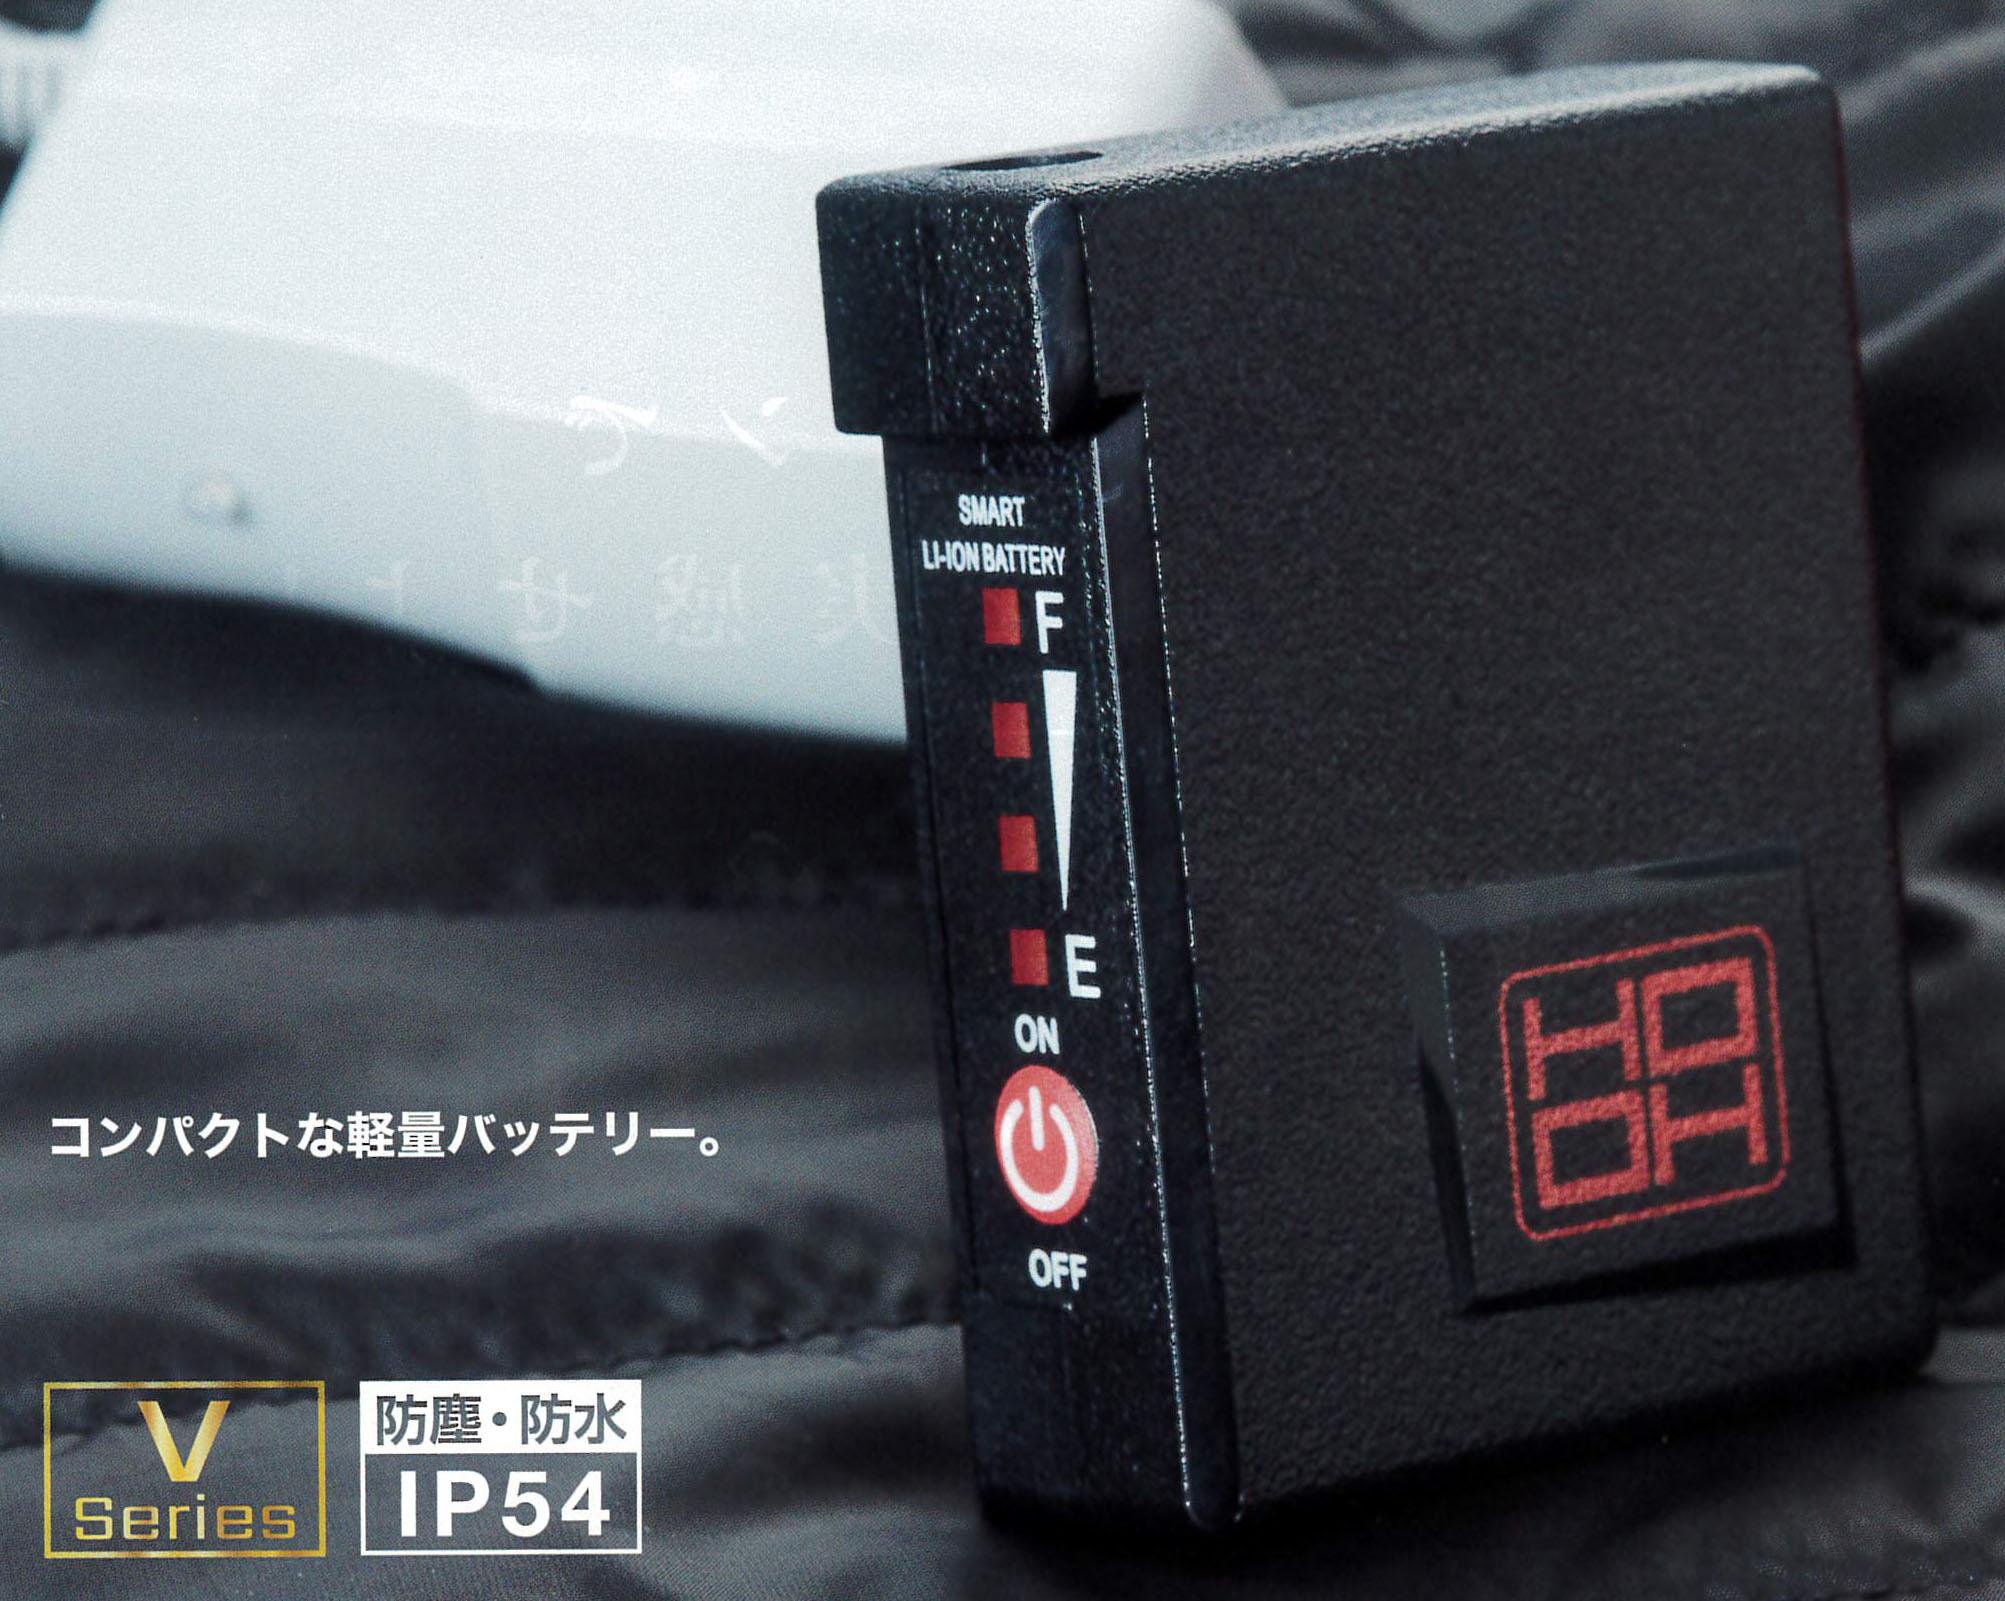 V1333 スモールバッテリー 業界最軽量123gコンパクトでパワフルな軽量バッテリー!!